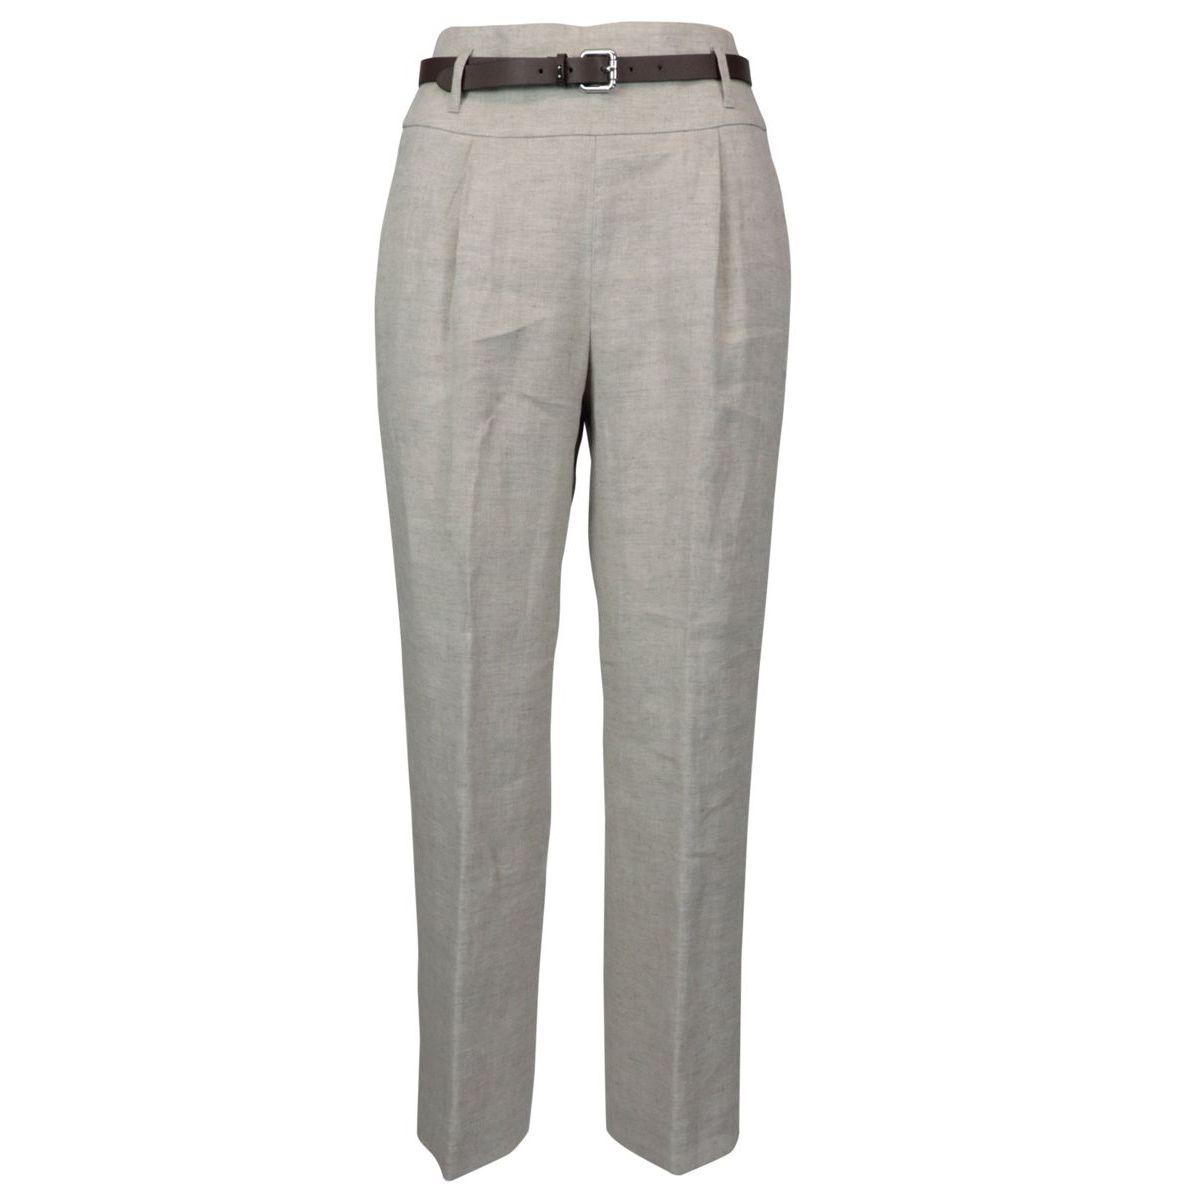 High waist linen trousers Sand PESERICO